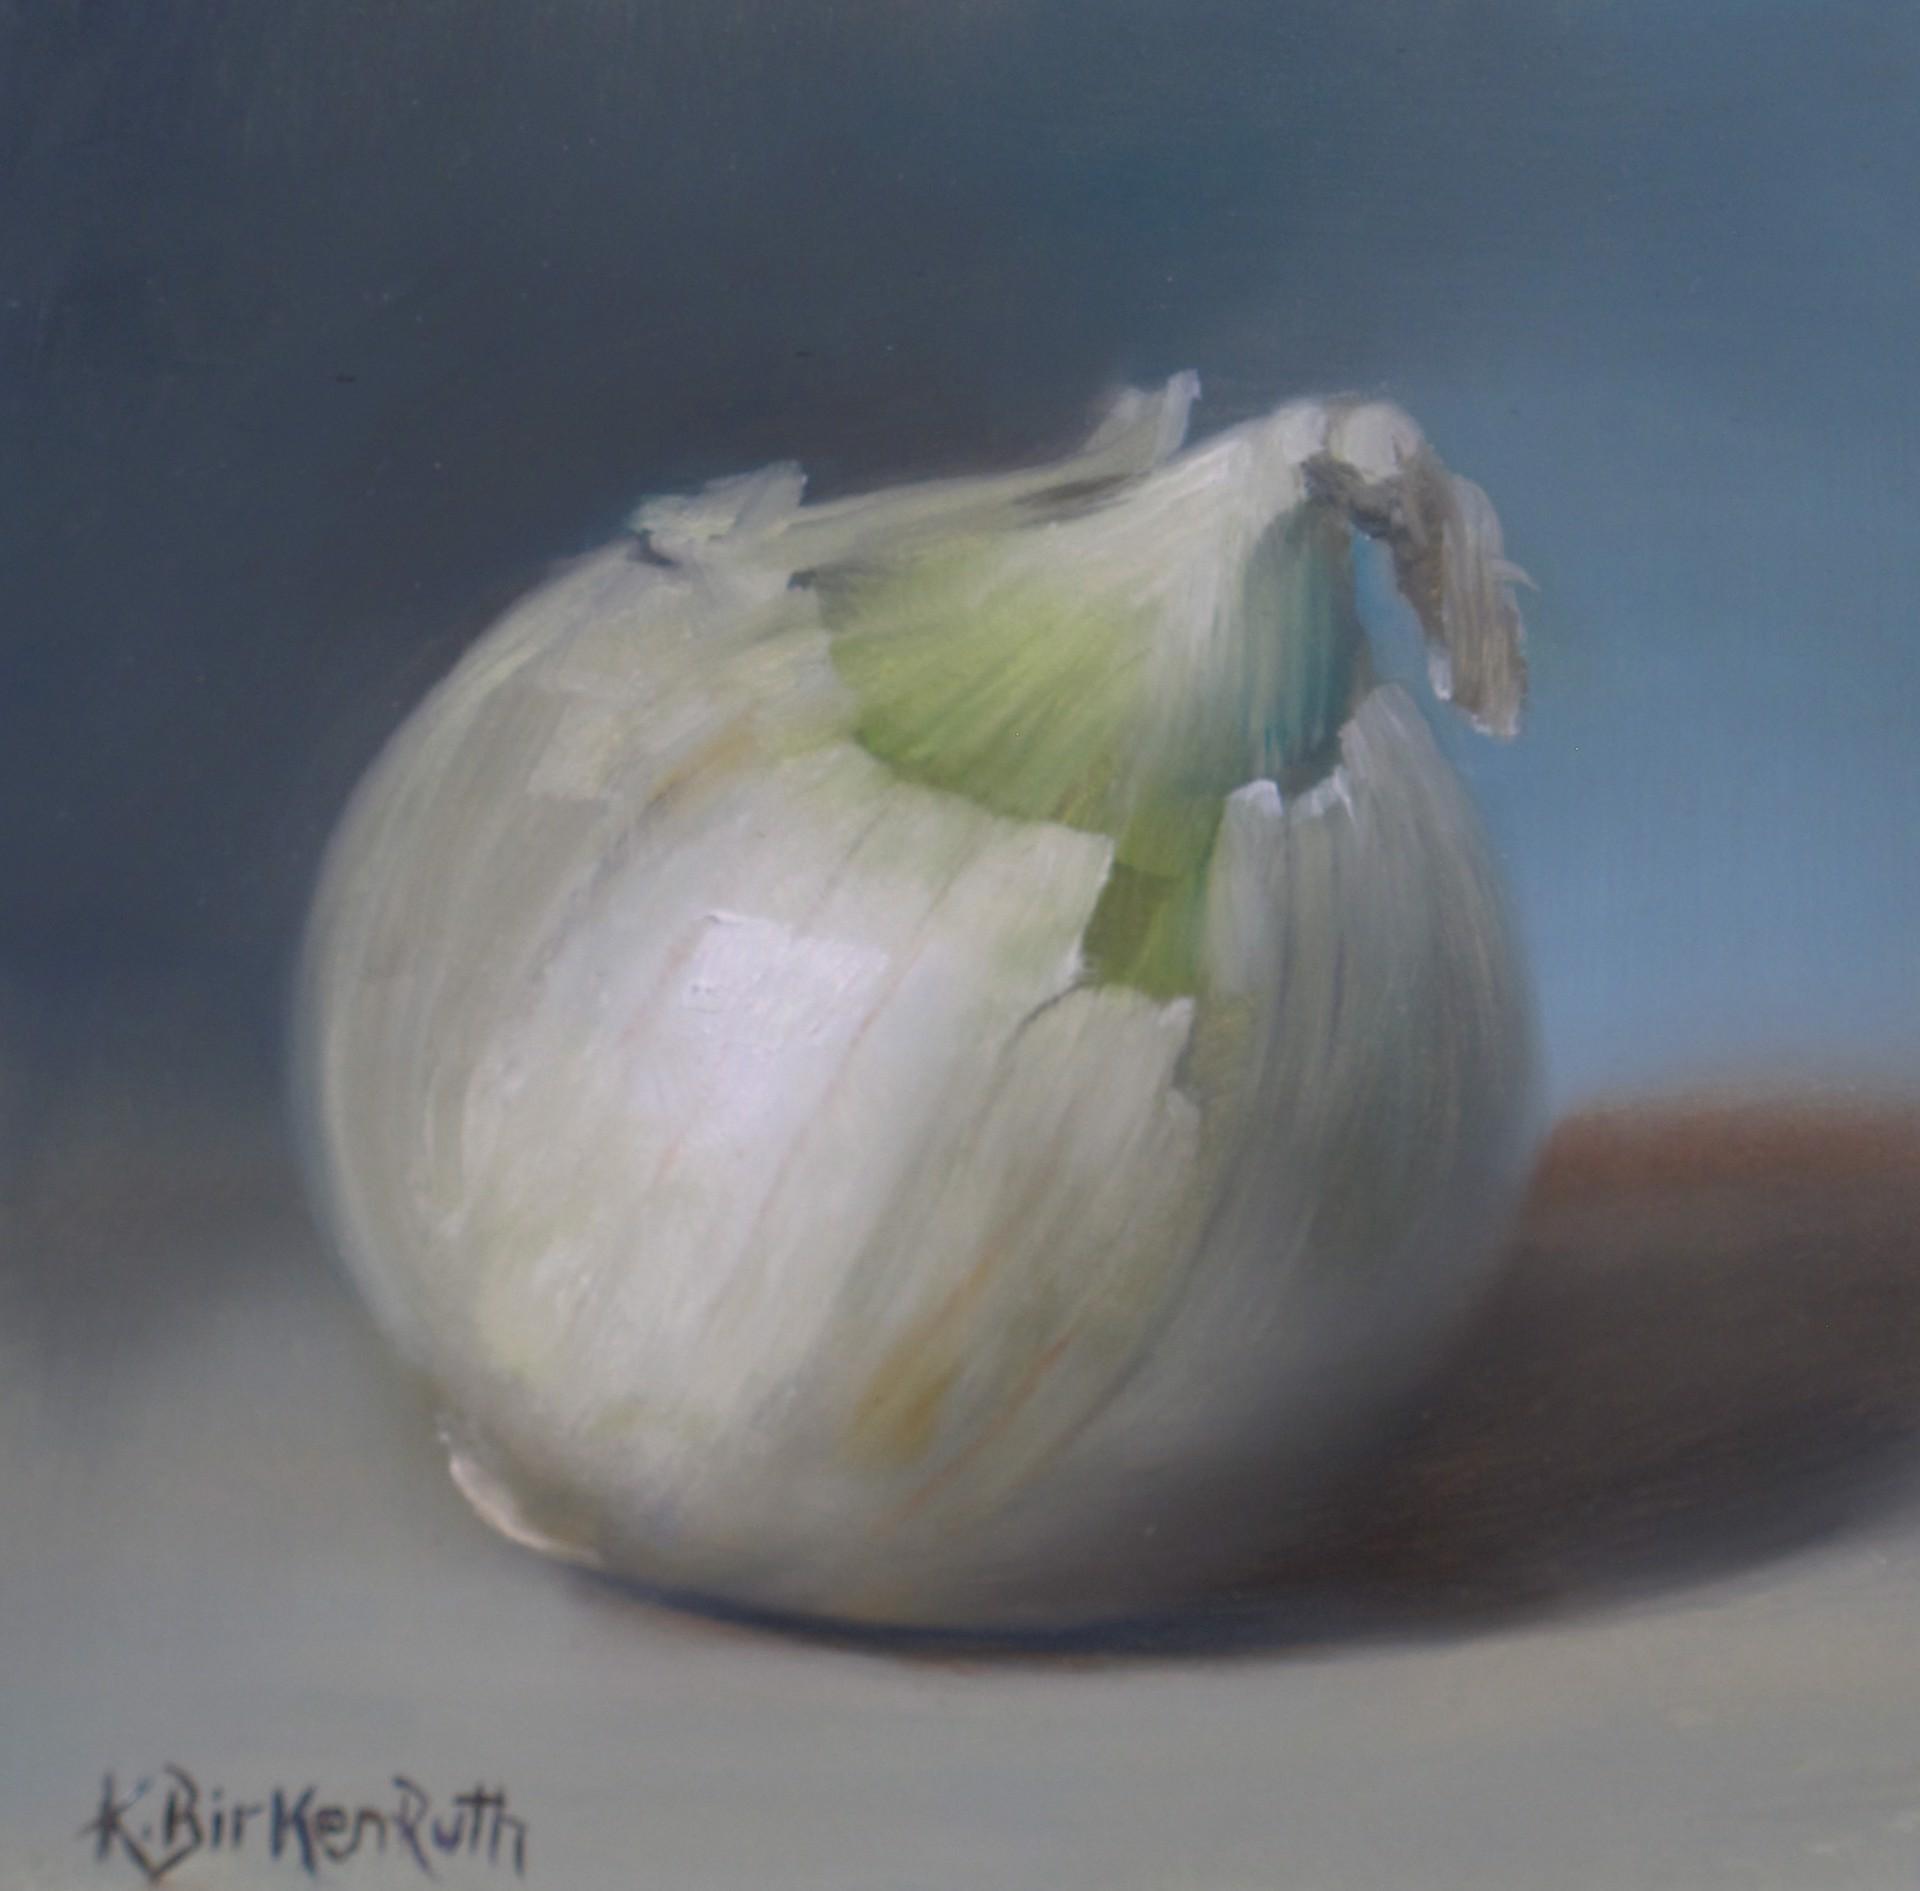 White Onion by Kelly Birkenruth